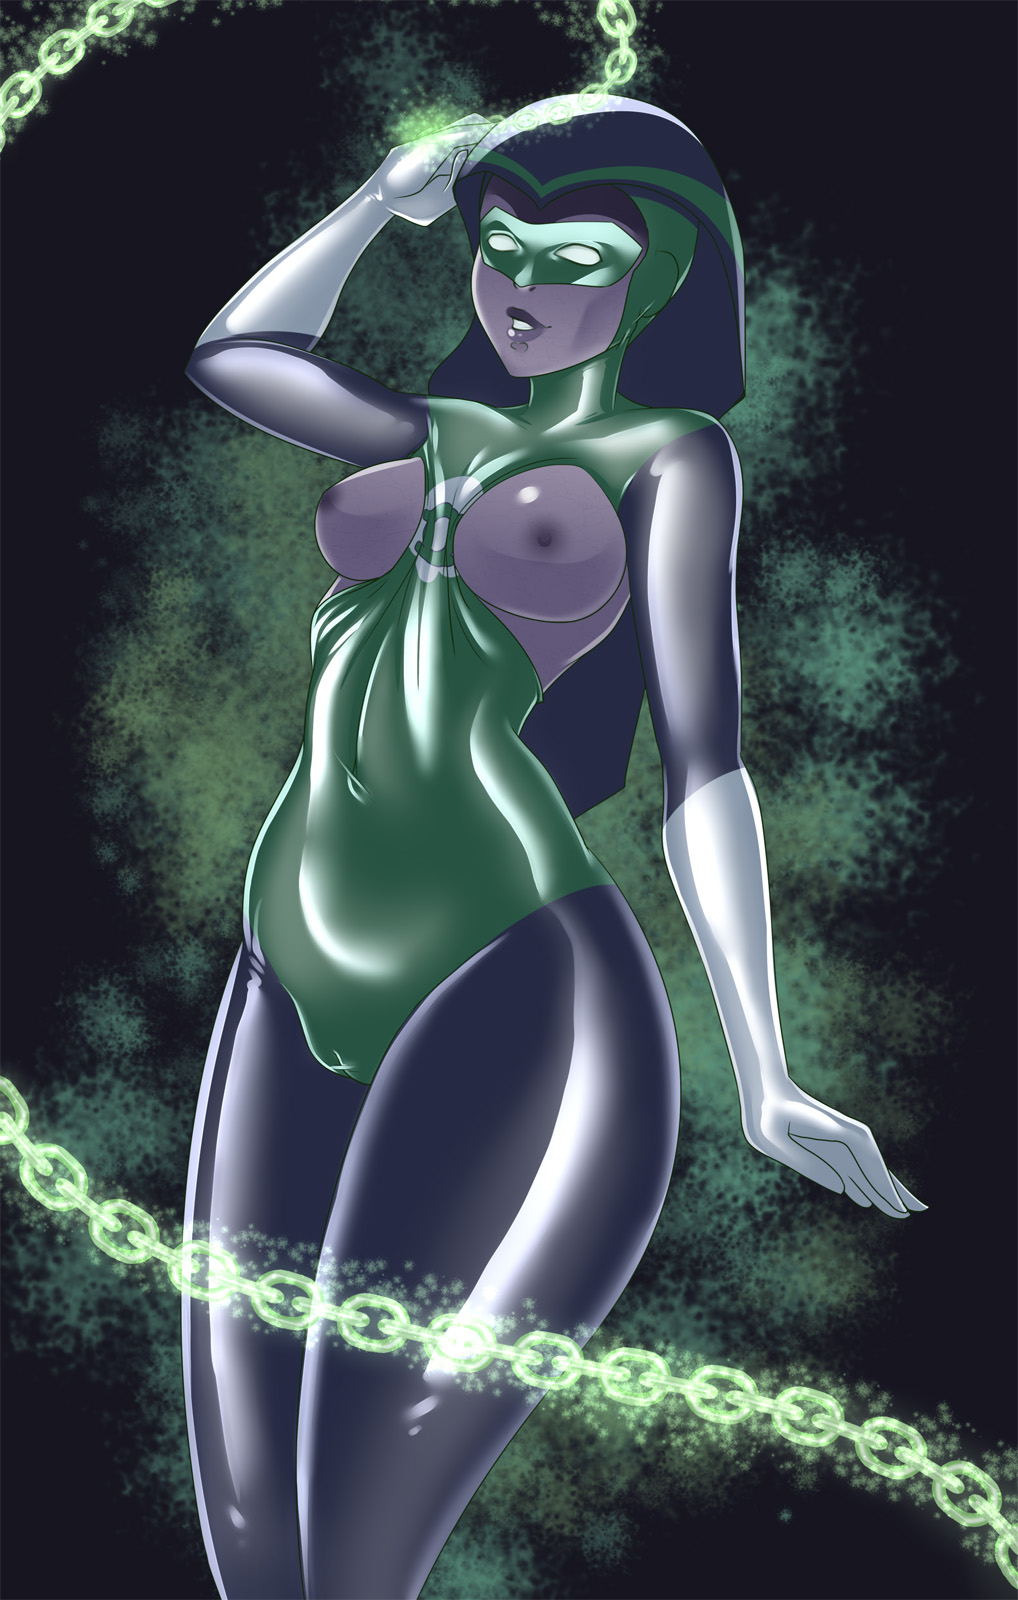 lantern hentai Green